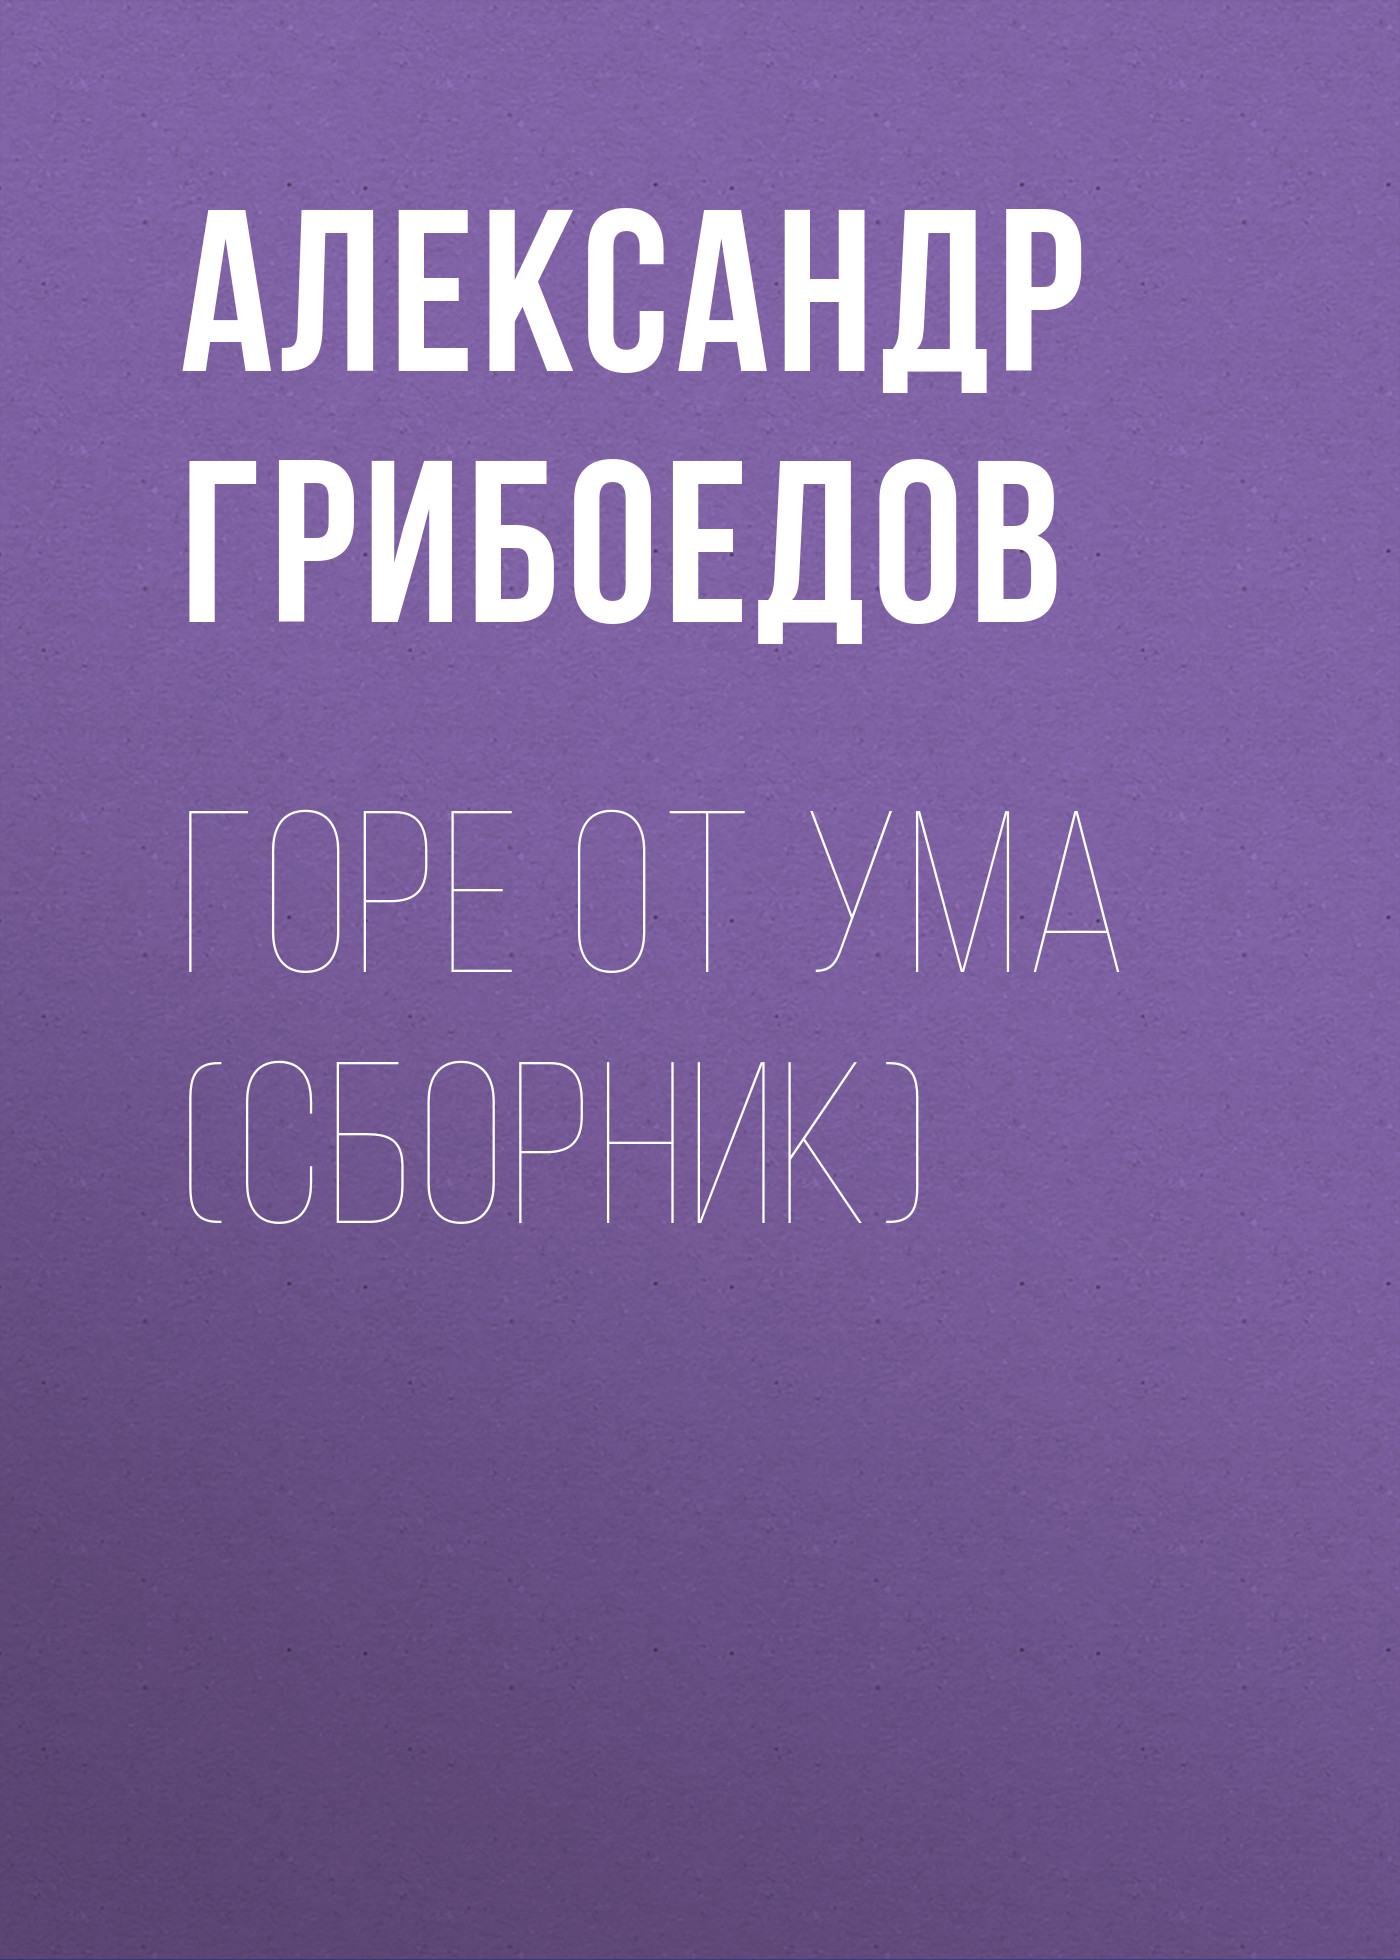 Горе от ума (сборник)